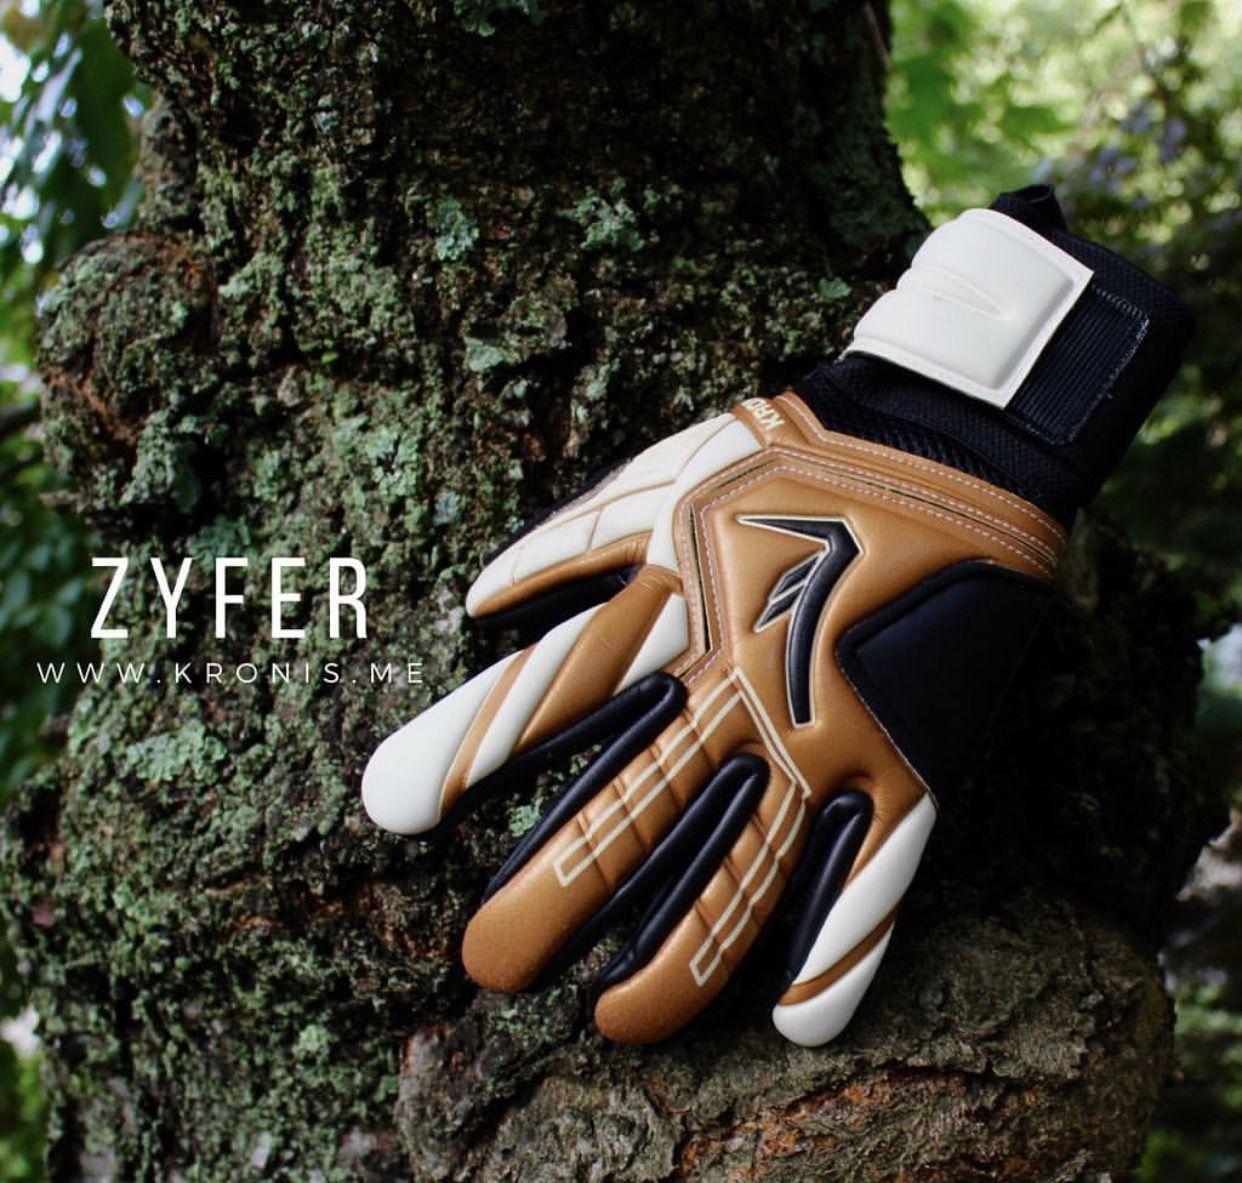 Goalkeeper gloves goalkeeper gloves athletic wear leather